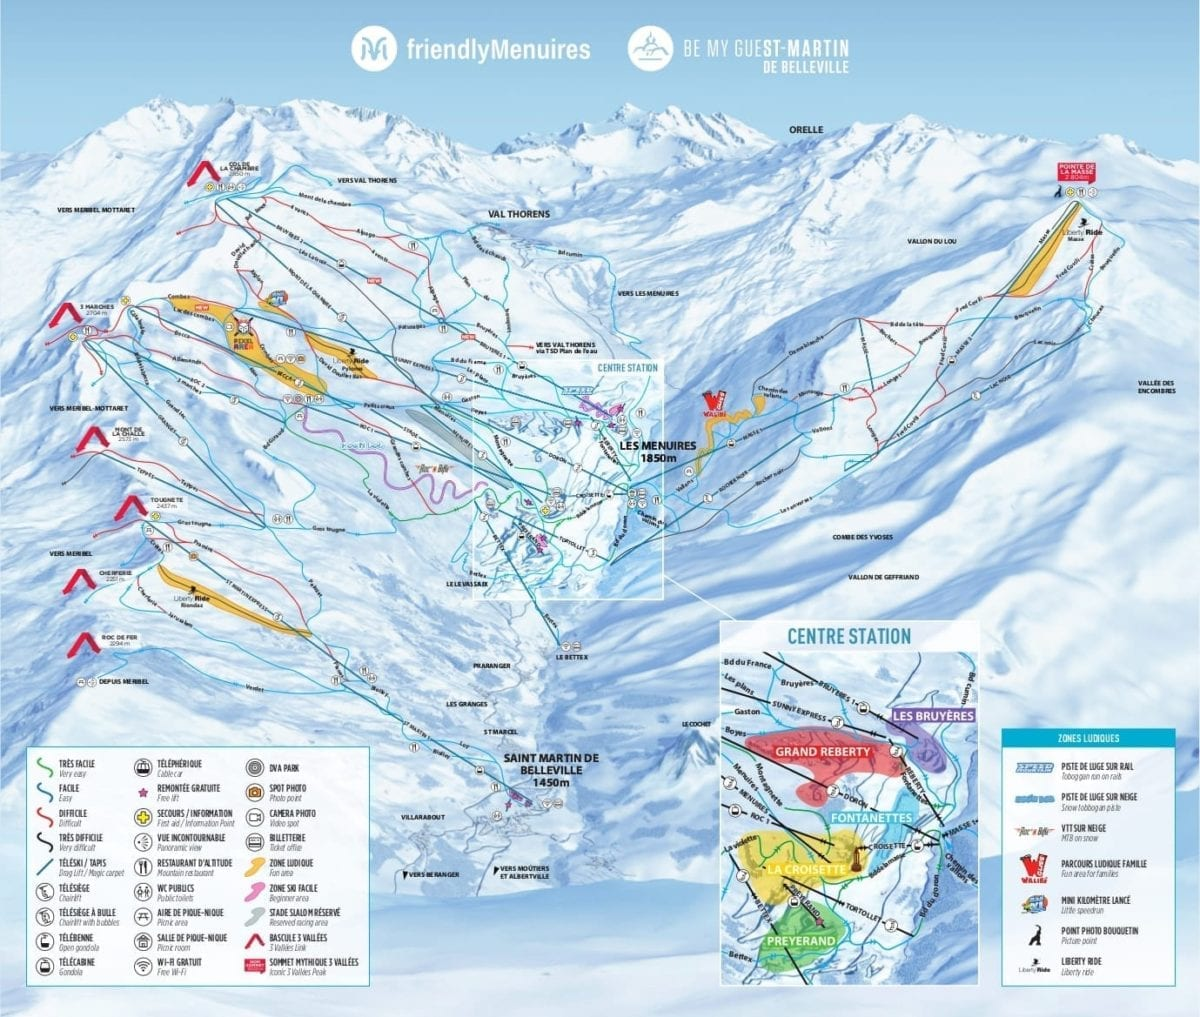 Les Menuires St Martin Trail Map 2019 1 1